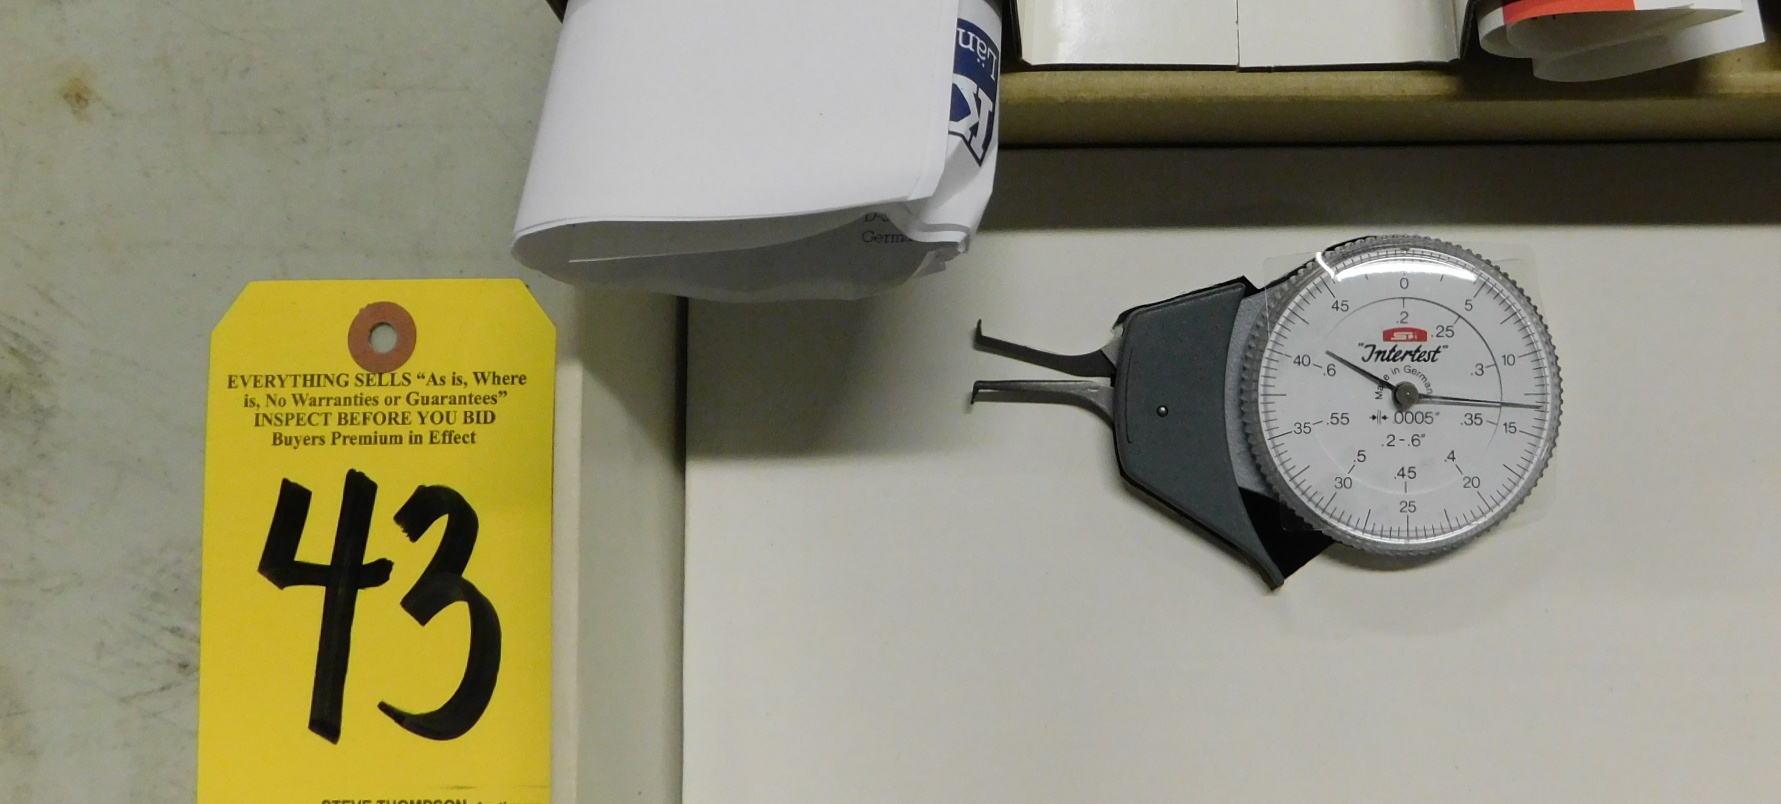 Lot 43 - Kroeplin Intertest Dial Caliper, 2 In. - 6 In., New